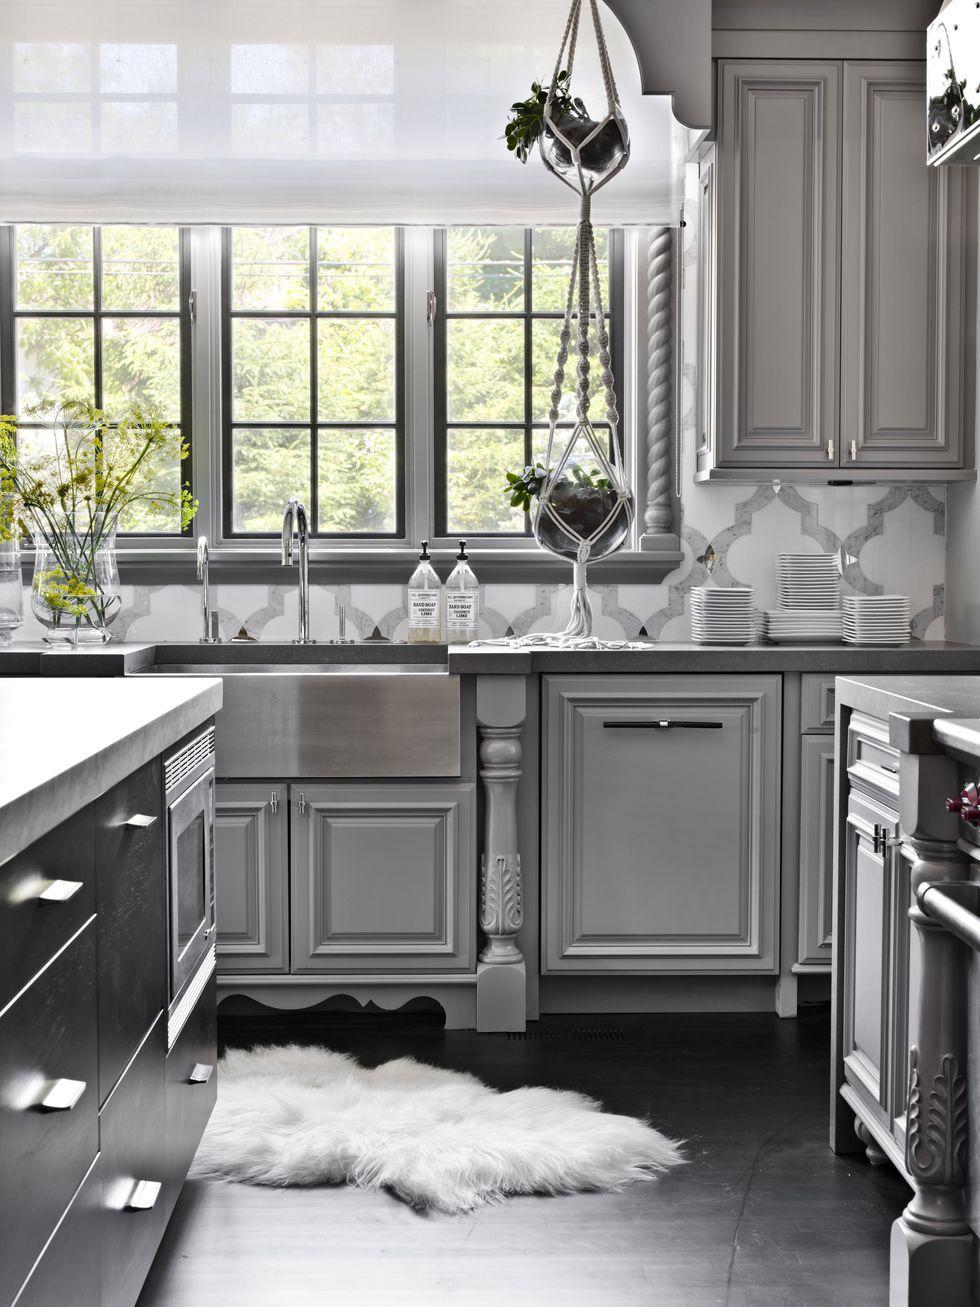 20 Eye-Catching Kitchen Tile Backsplash Ideas to Love